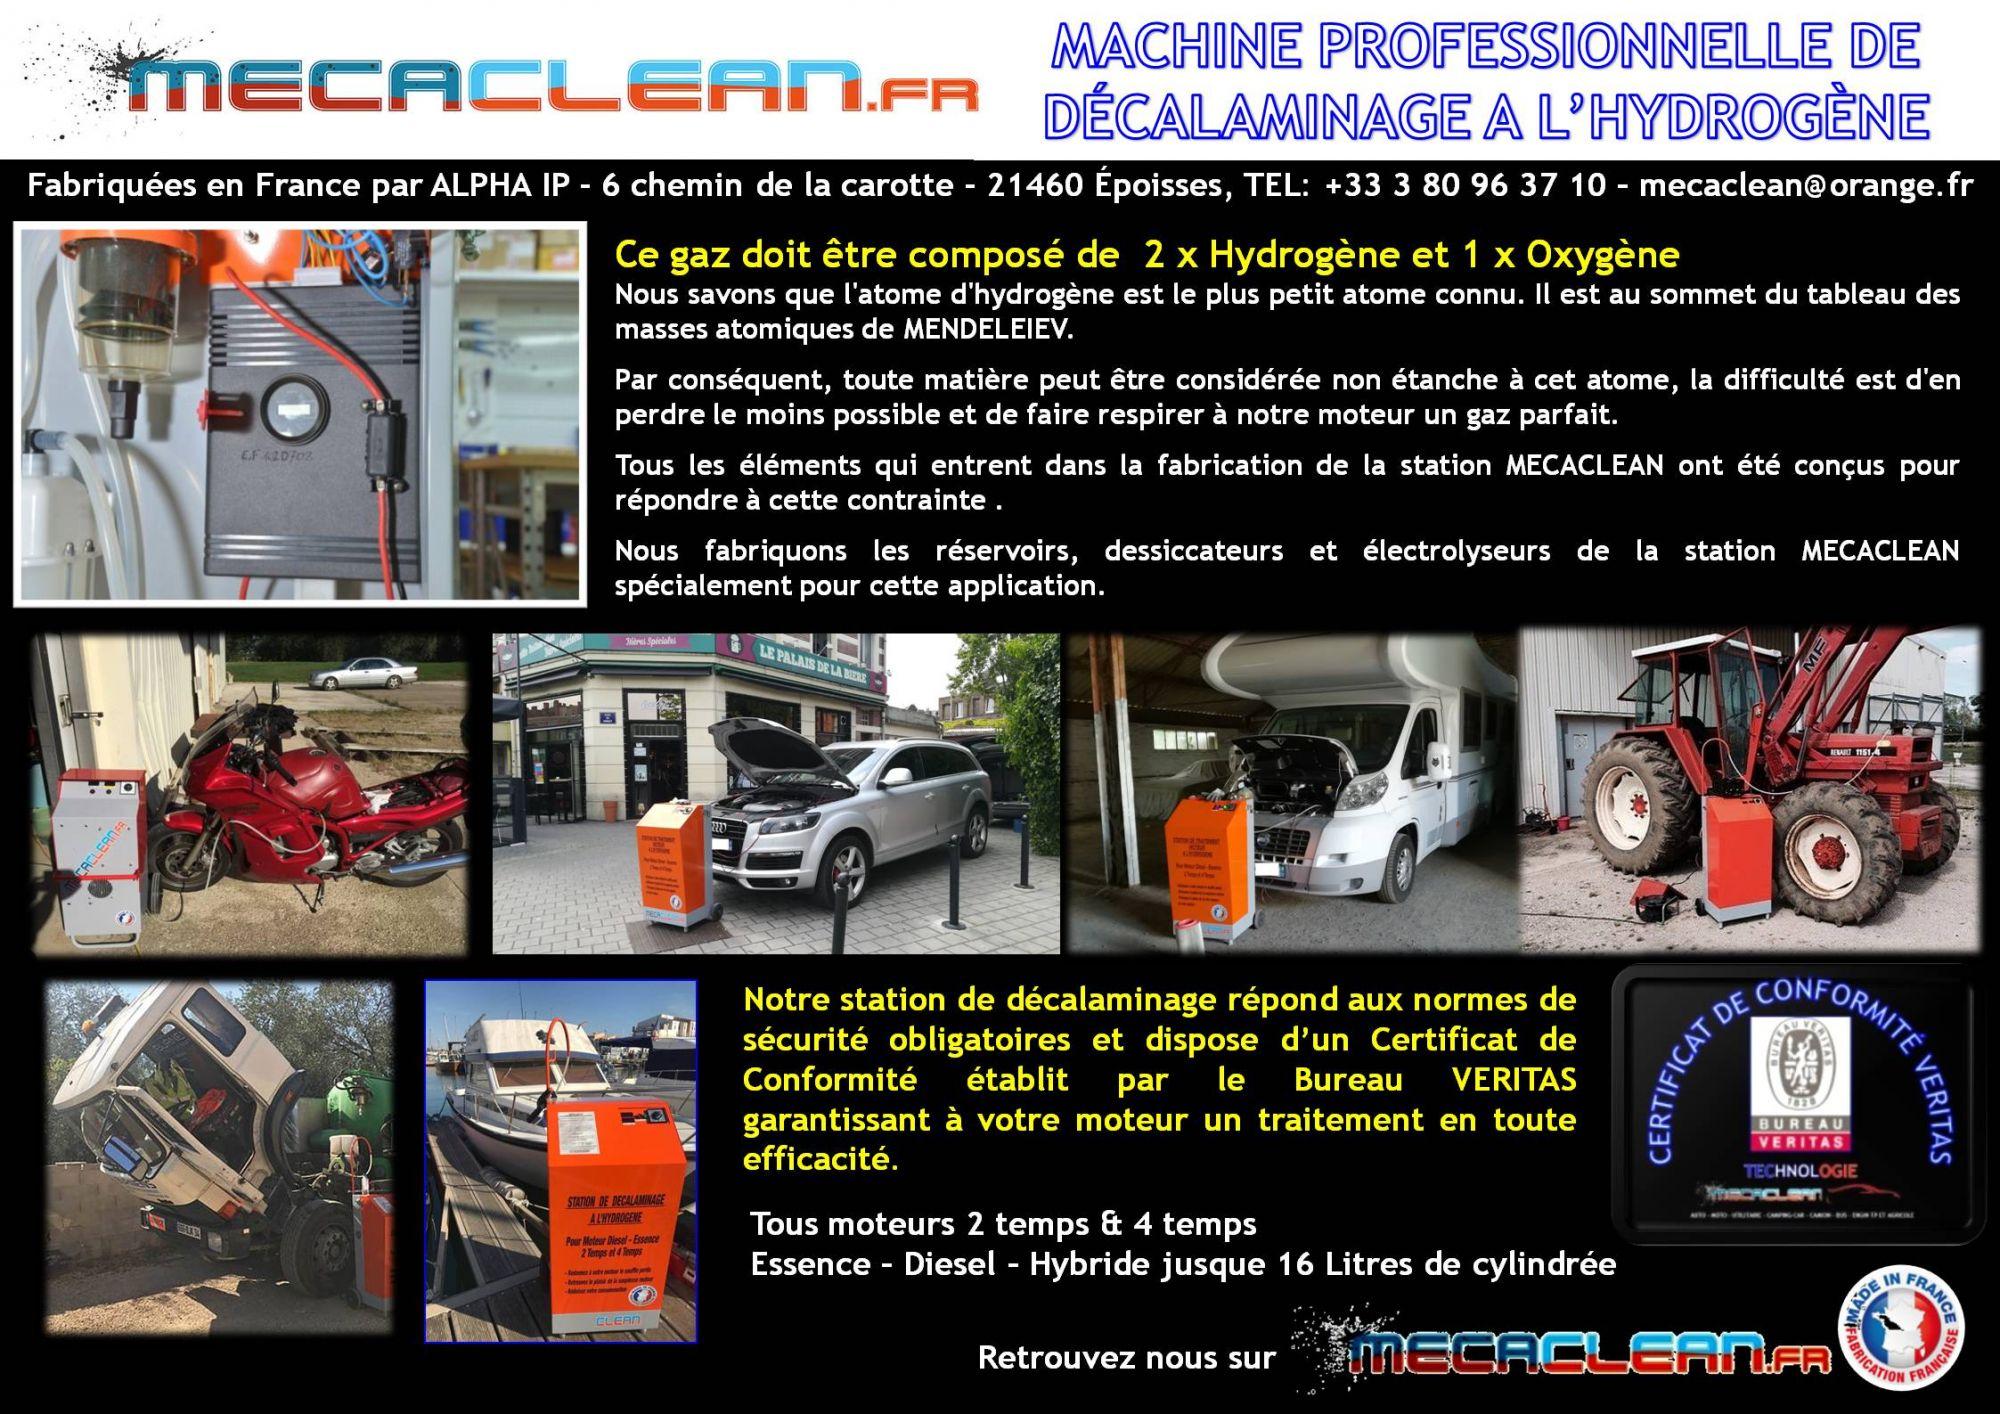 distributeur-mecaclean-3-jpeg